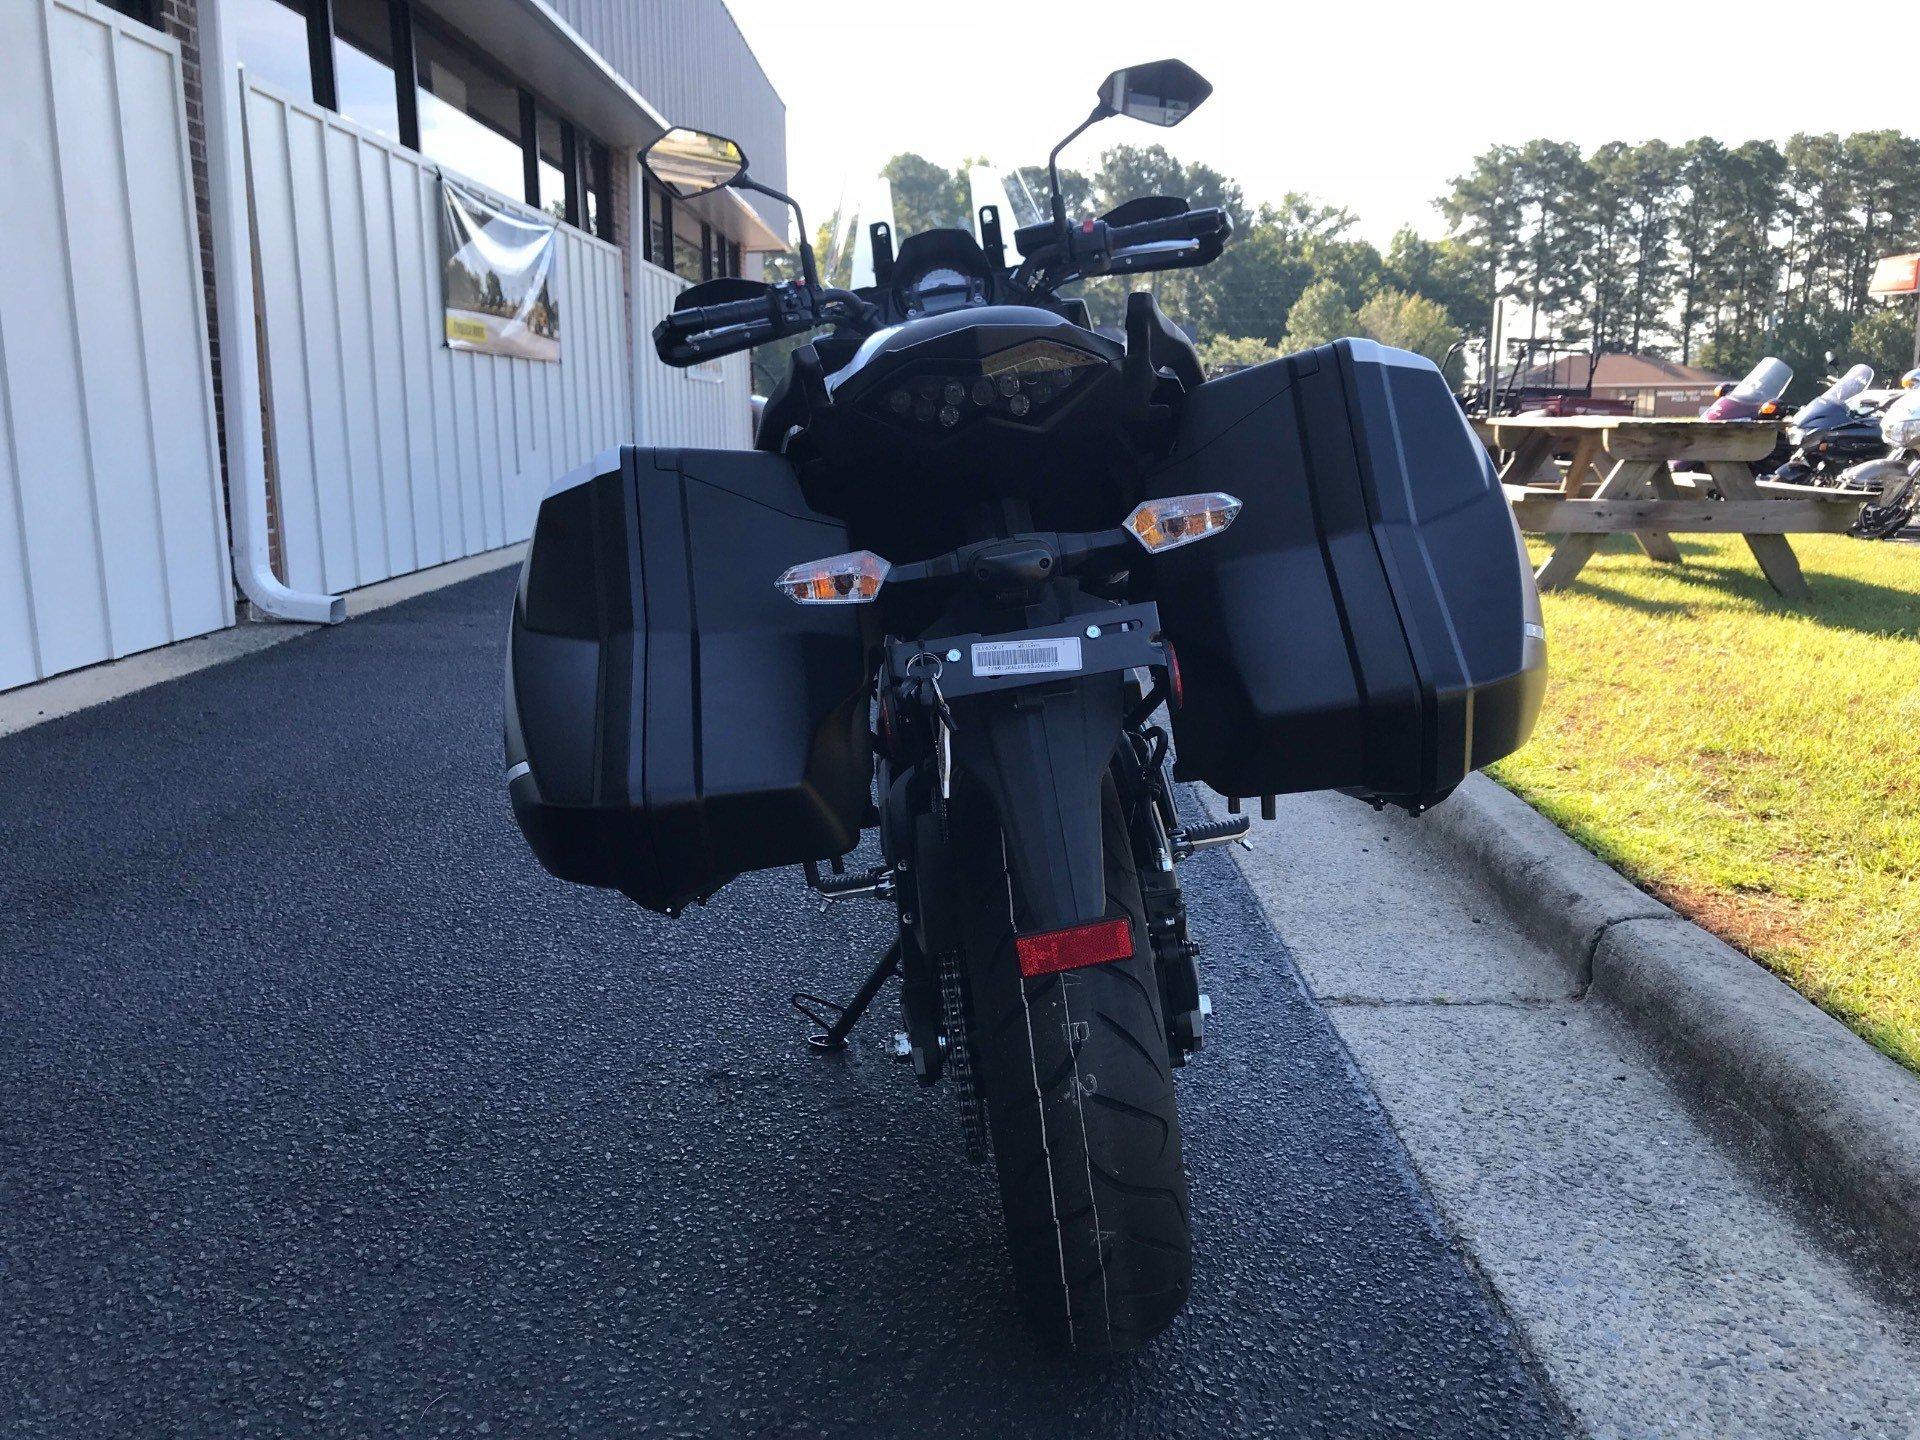 2018 Kawasaki Versys 650 LT 10